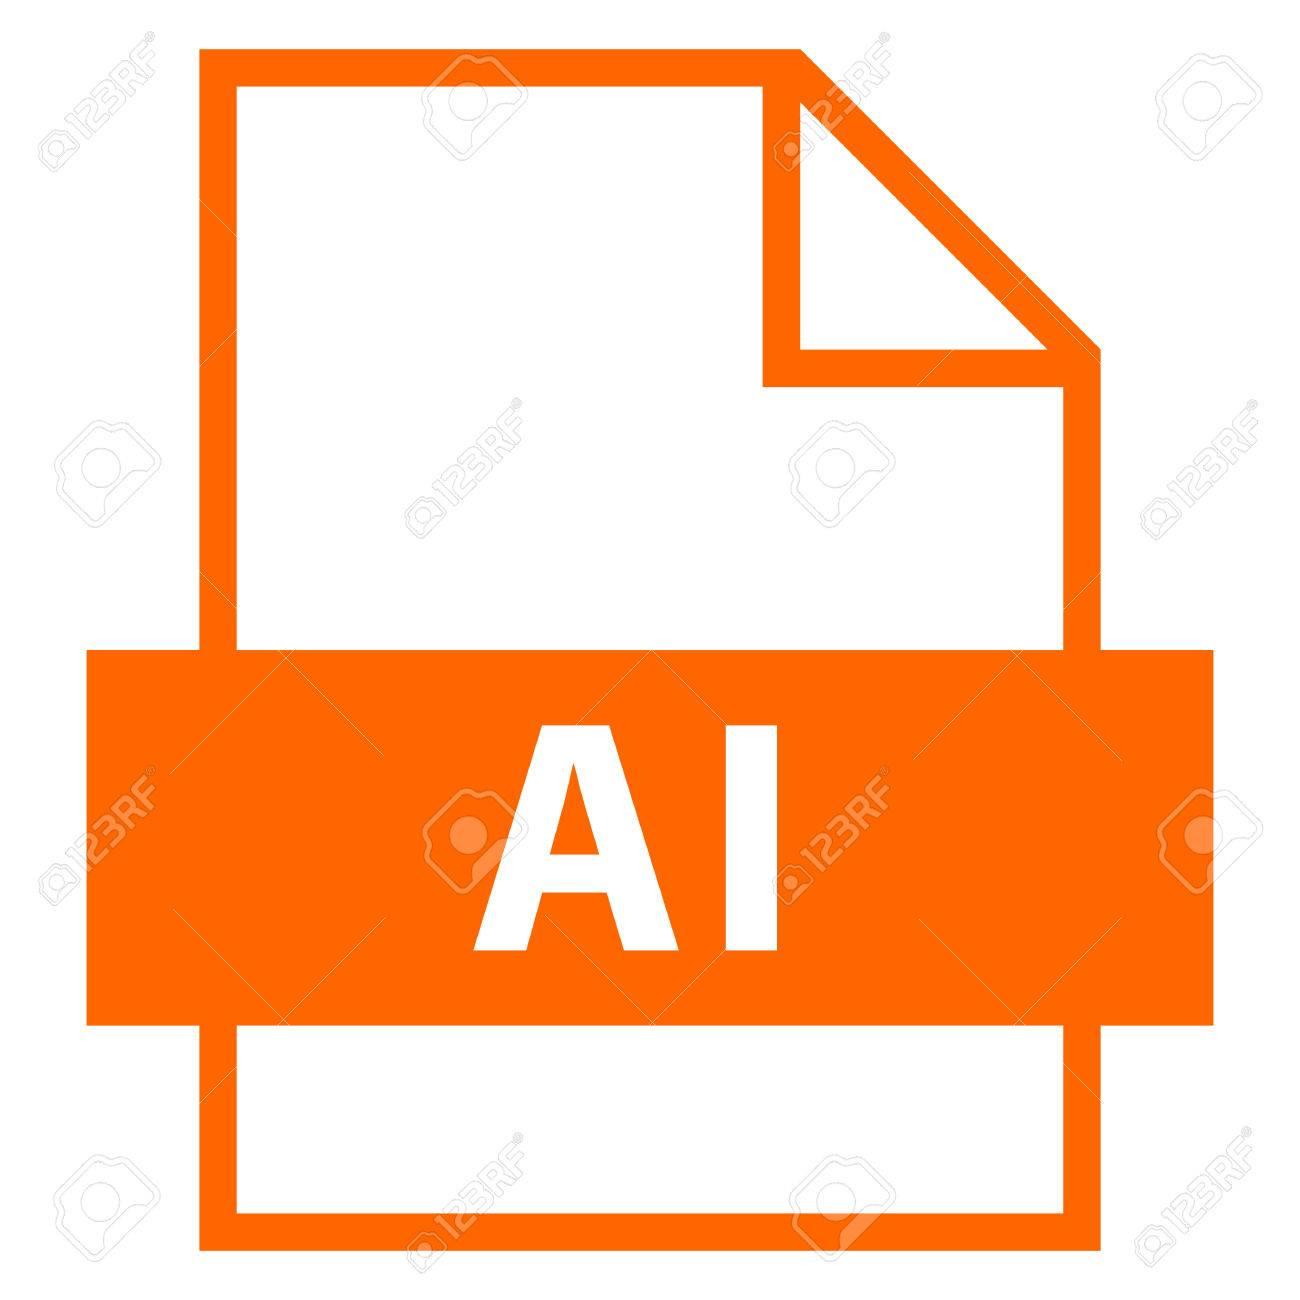 Use it in all your designs  Filename extension icon AI Adobe